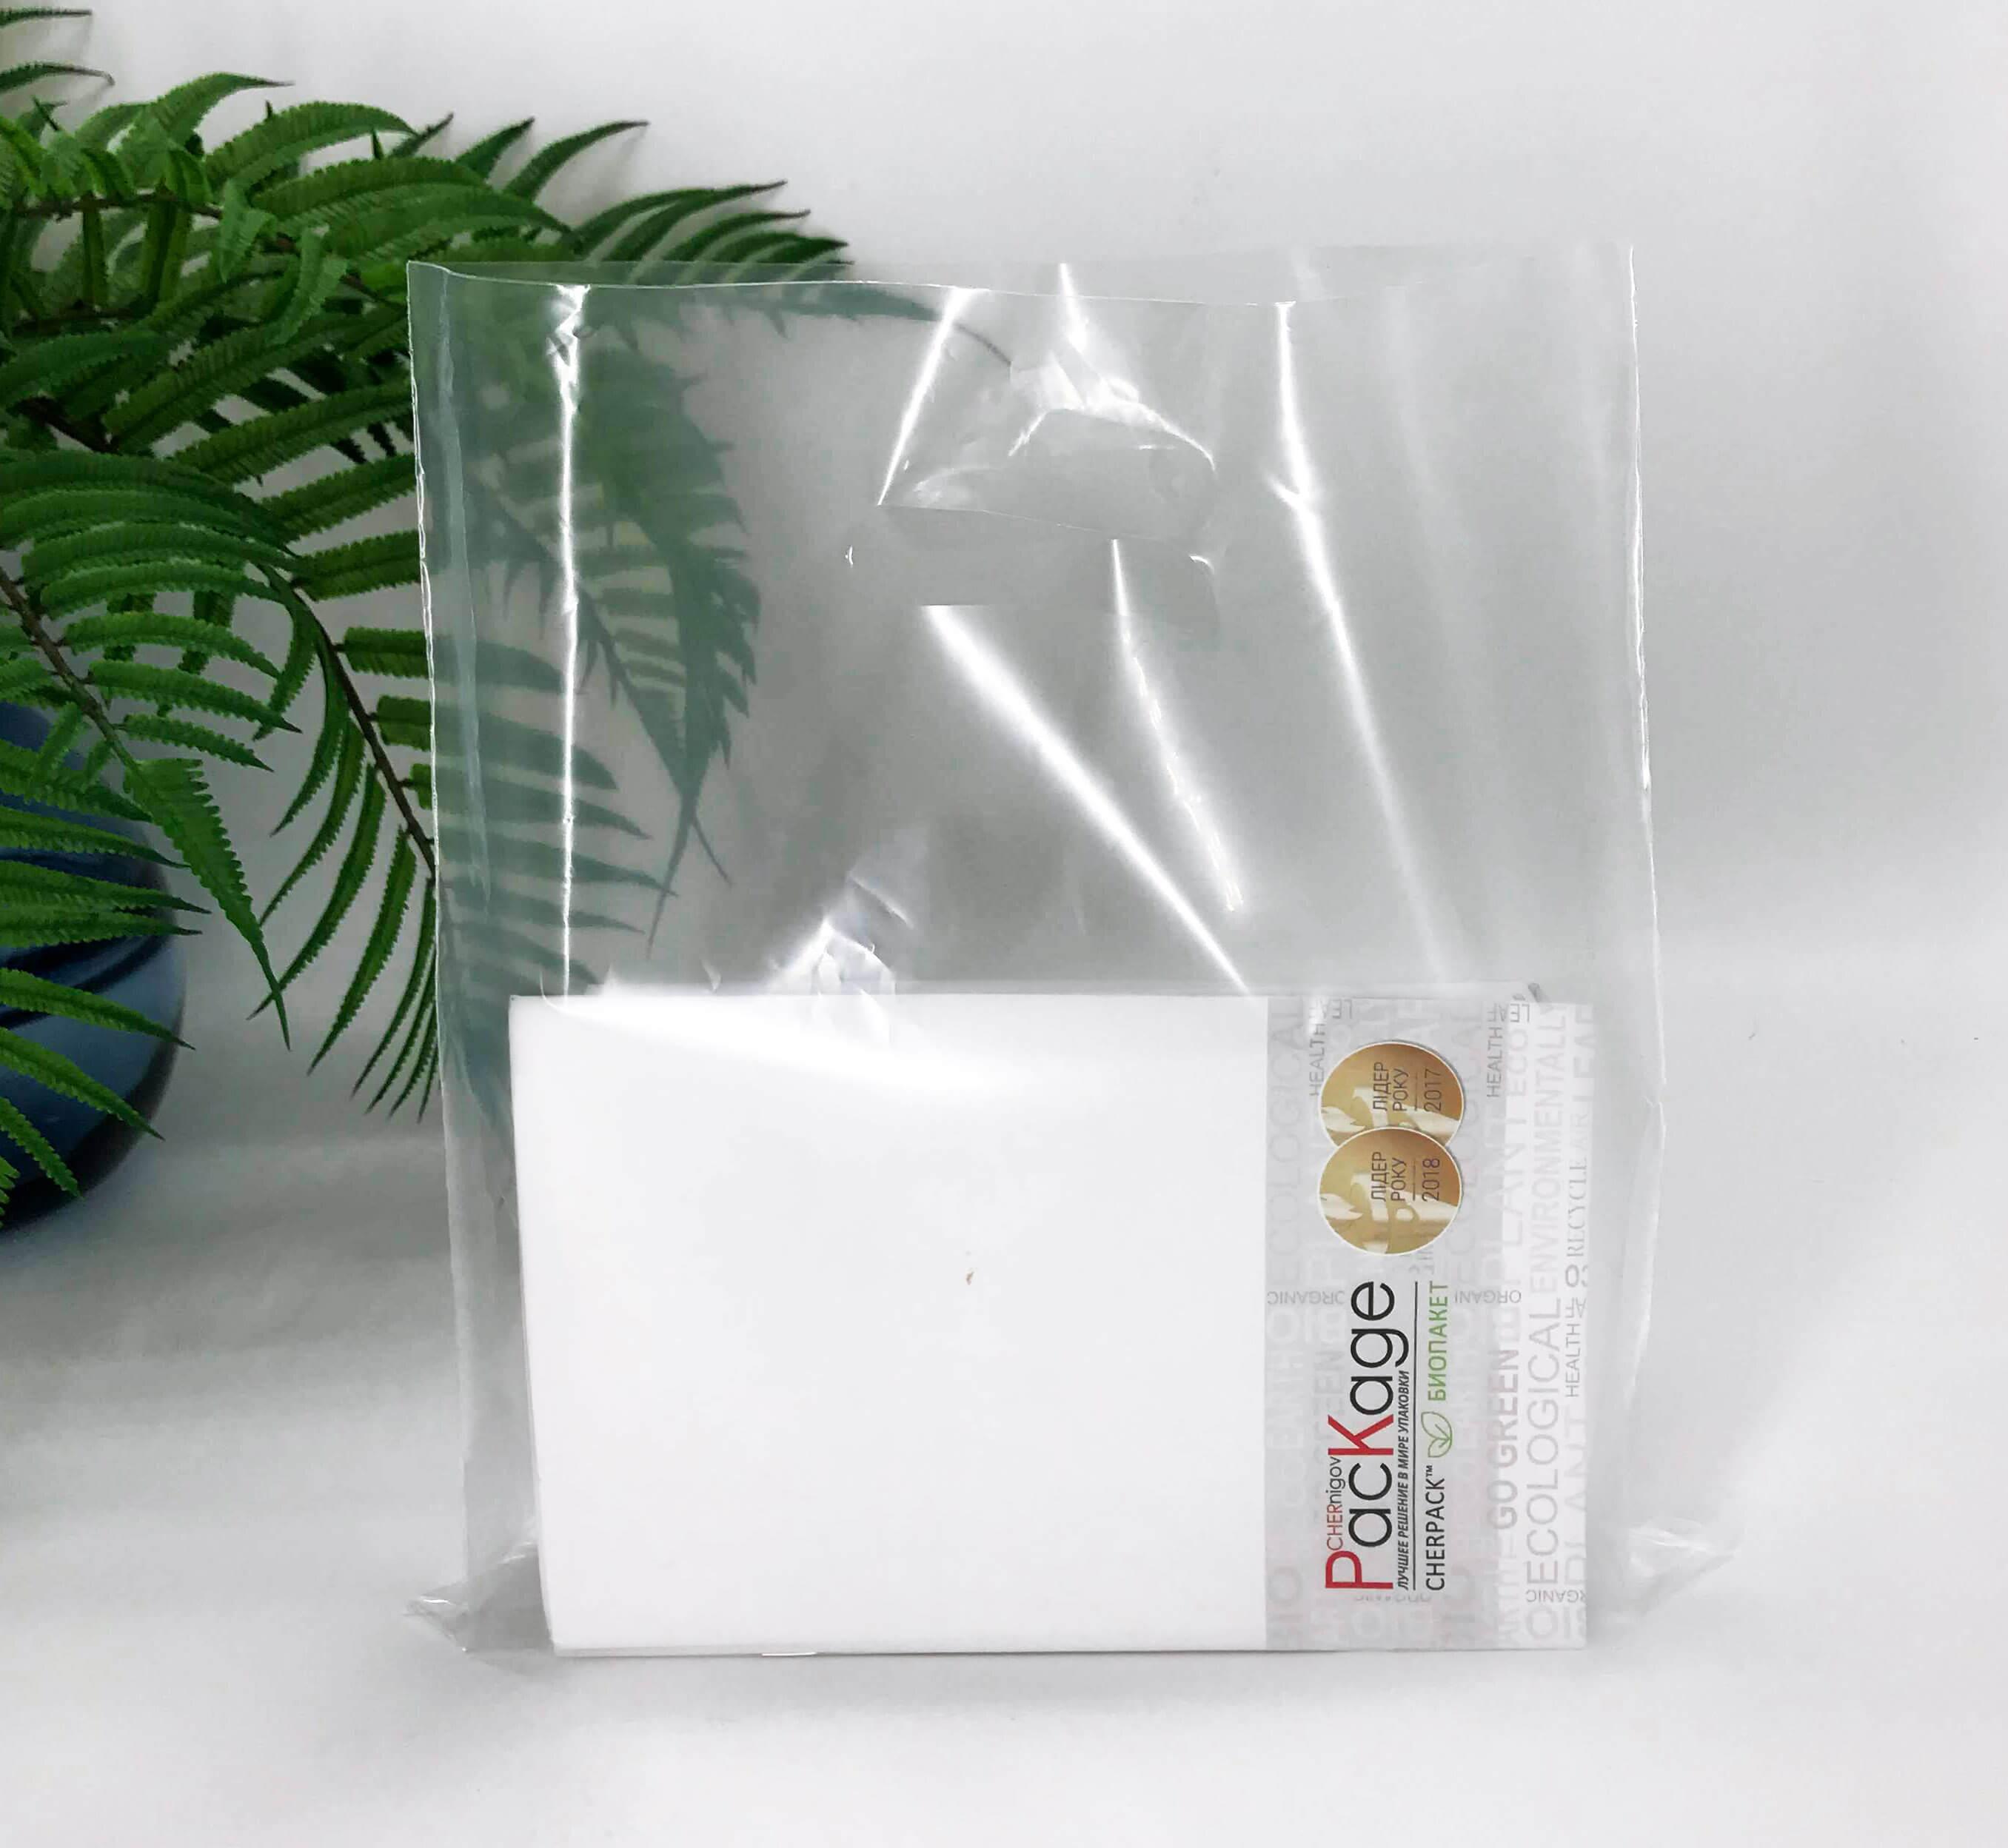 БИОпакет активированный (без печати) типа